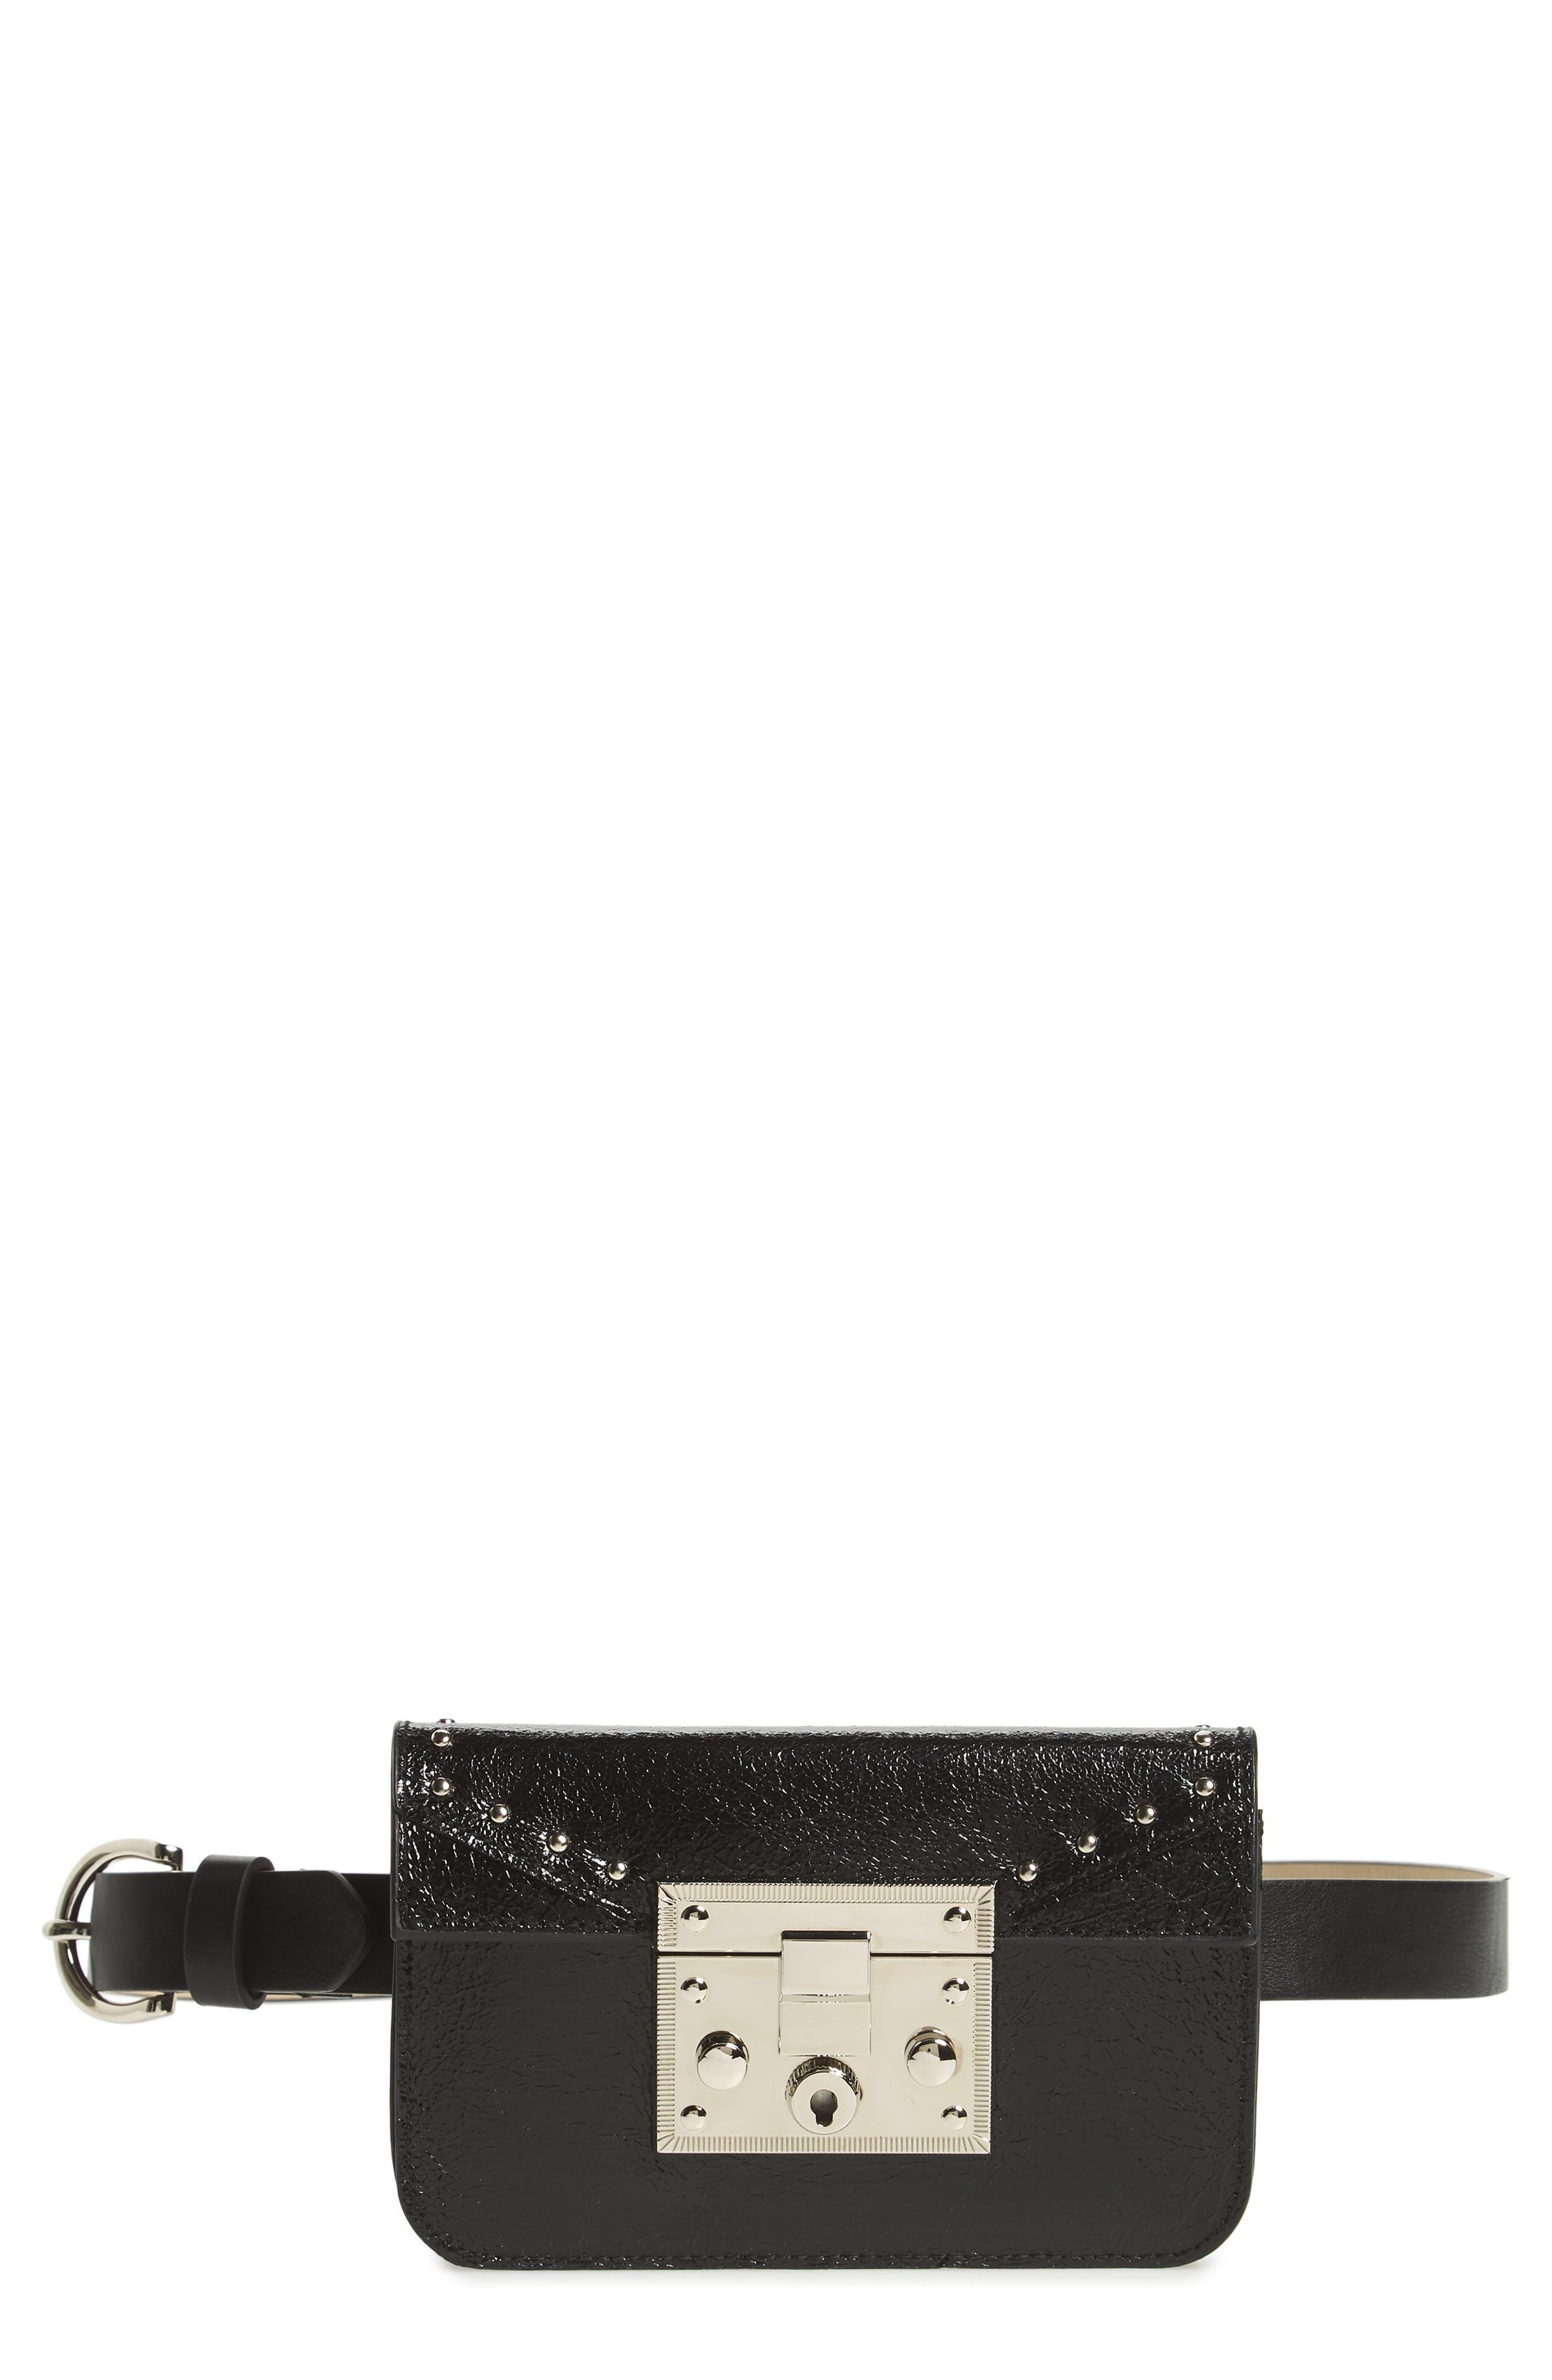 Main Image - Steve Madden Hardware Belt Bag